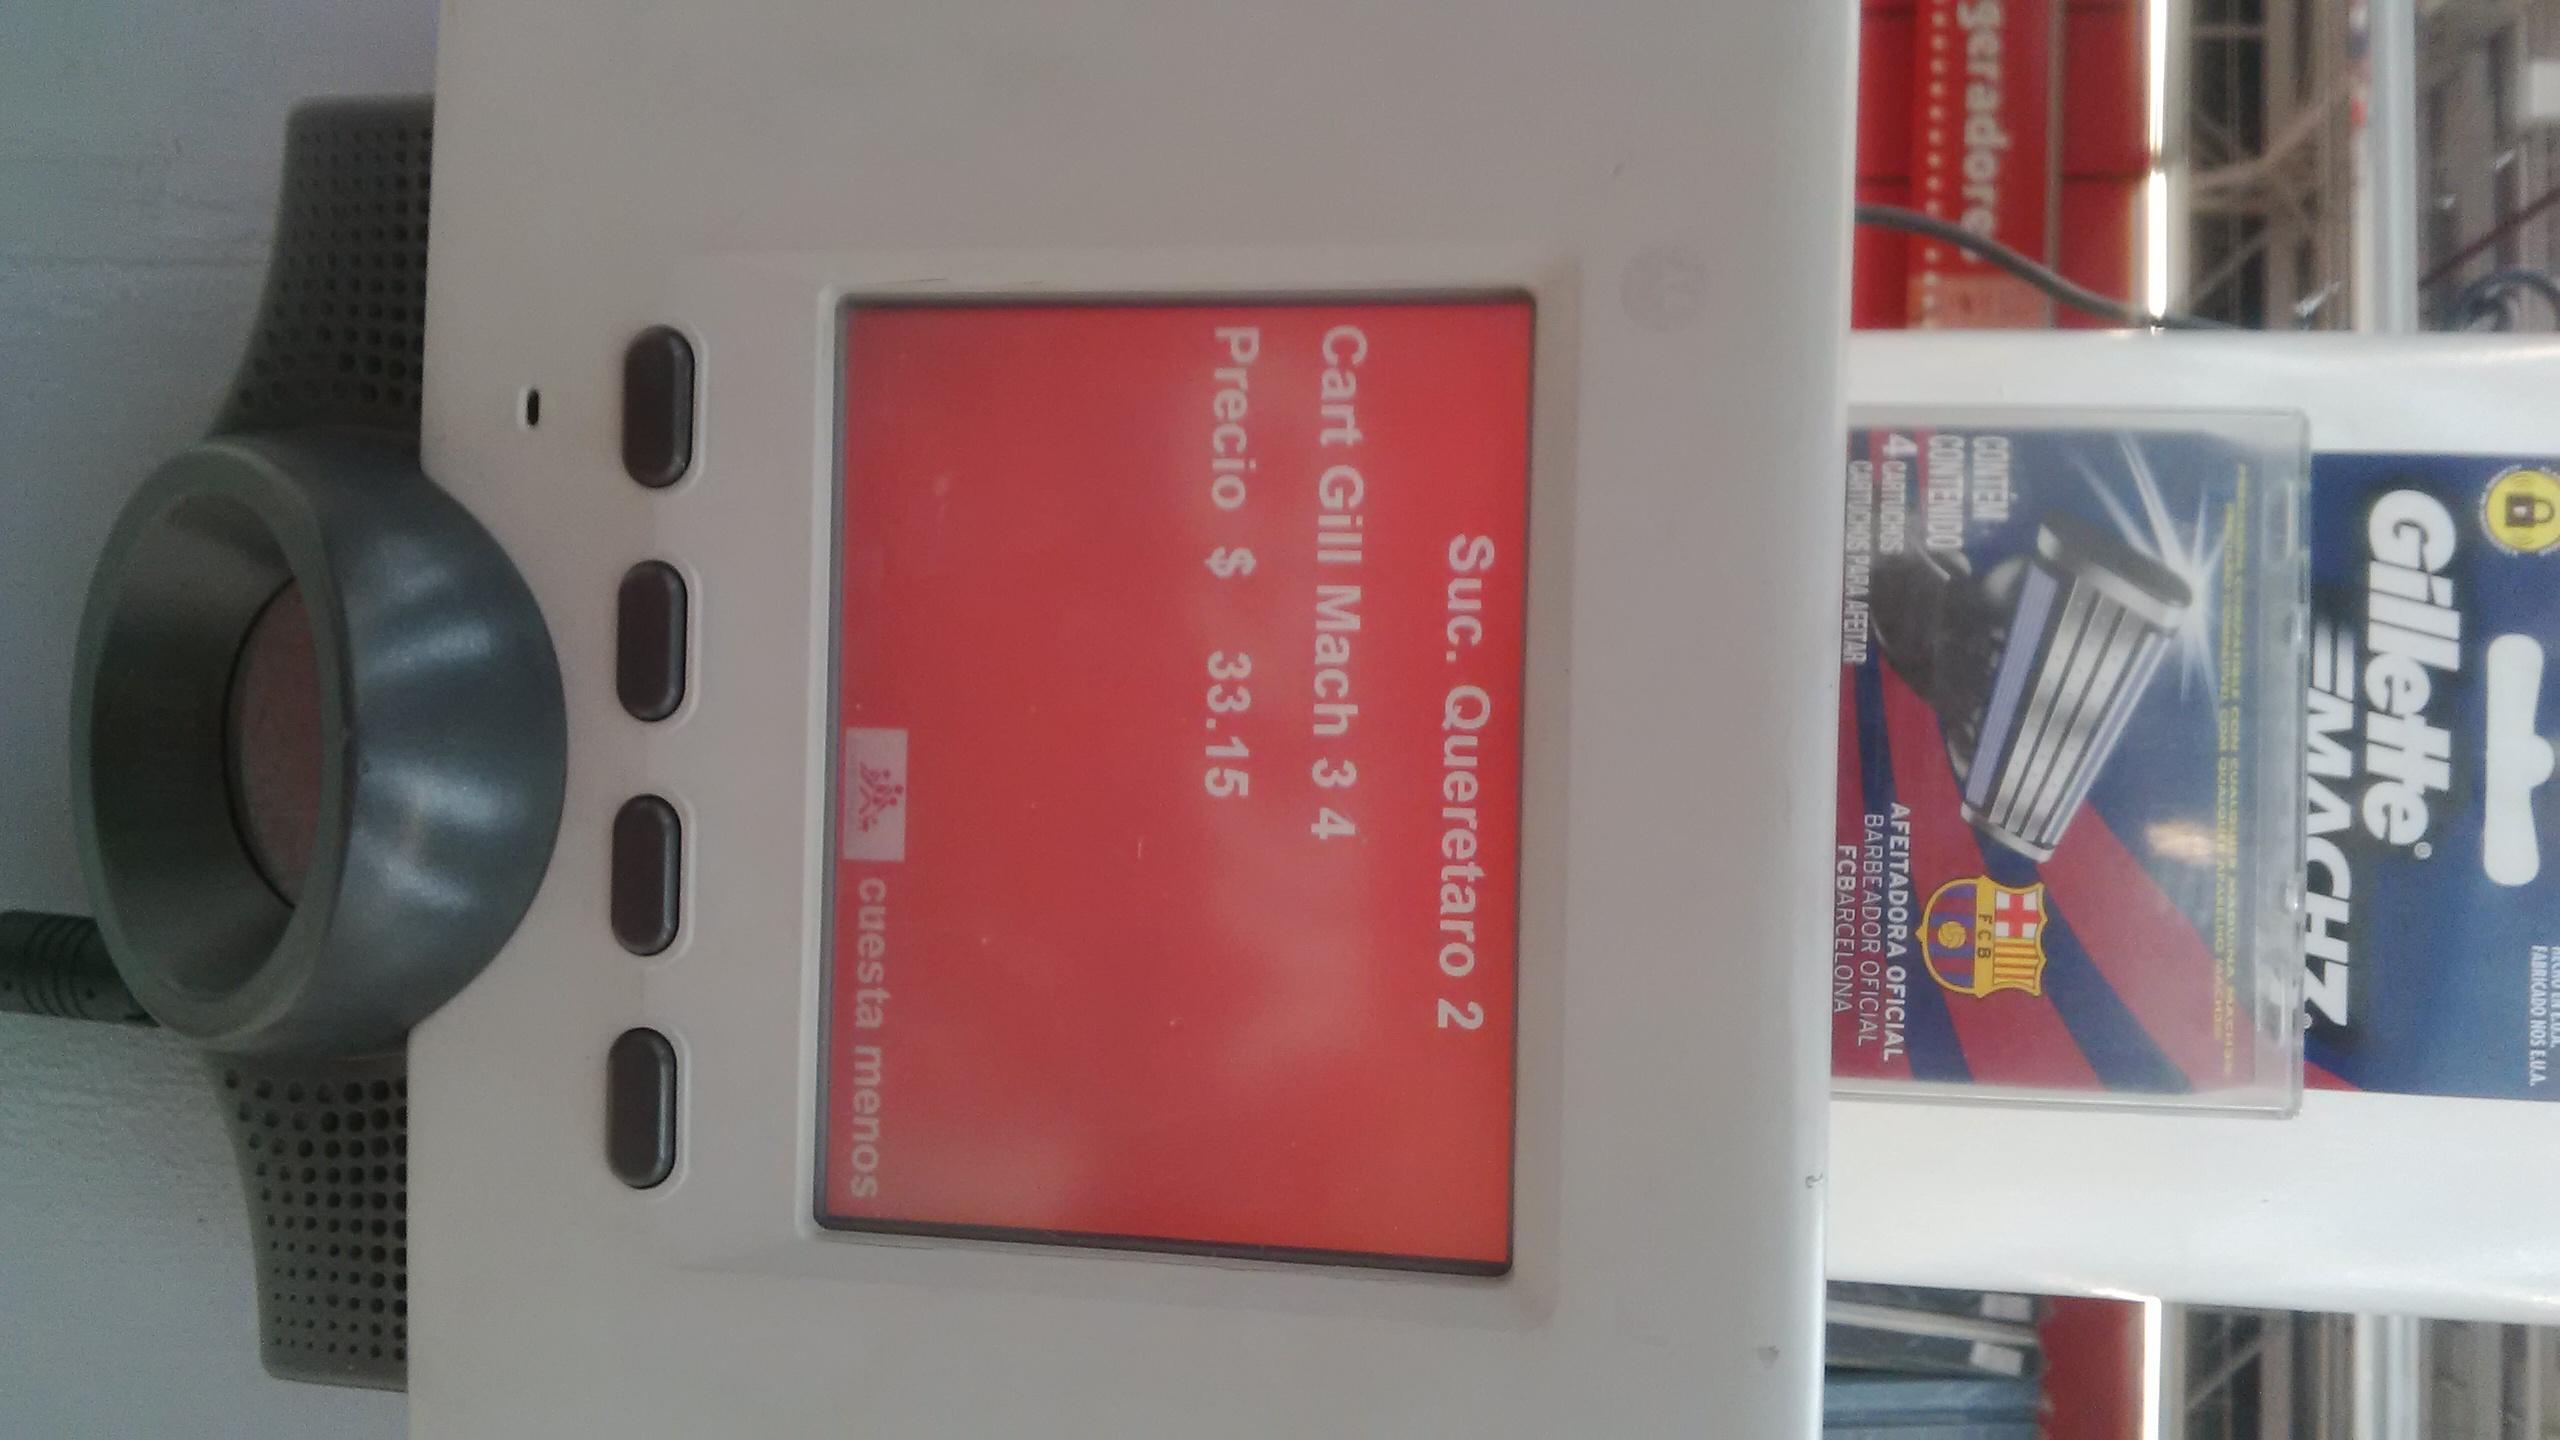 Chedraui: 4 cartuchos gillette barcelona $33.14